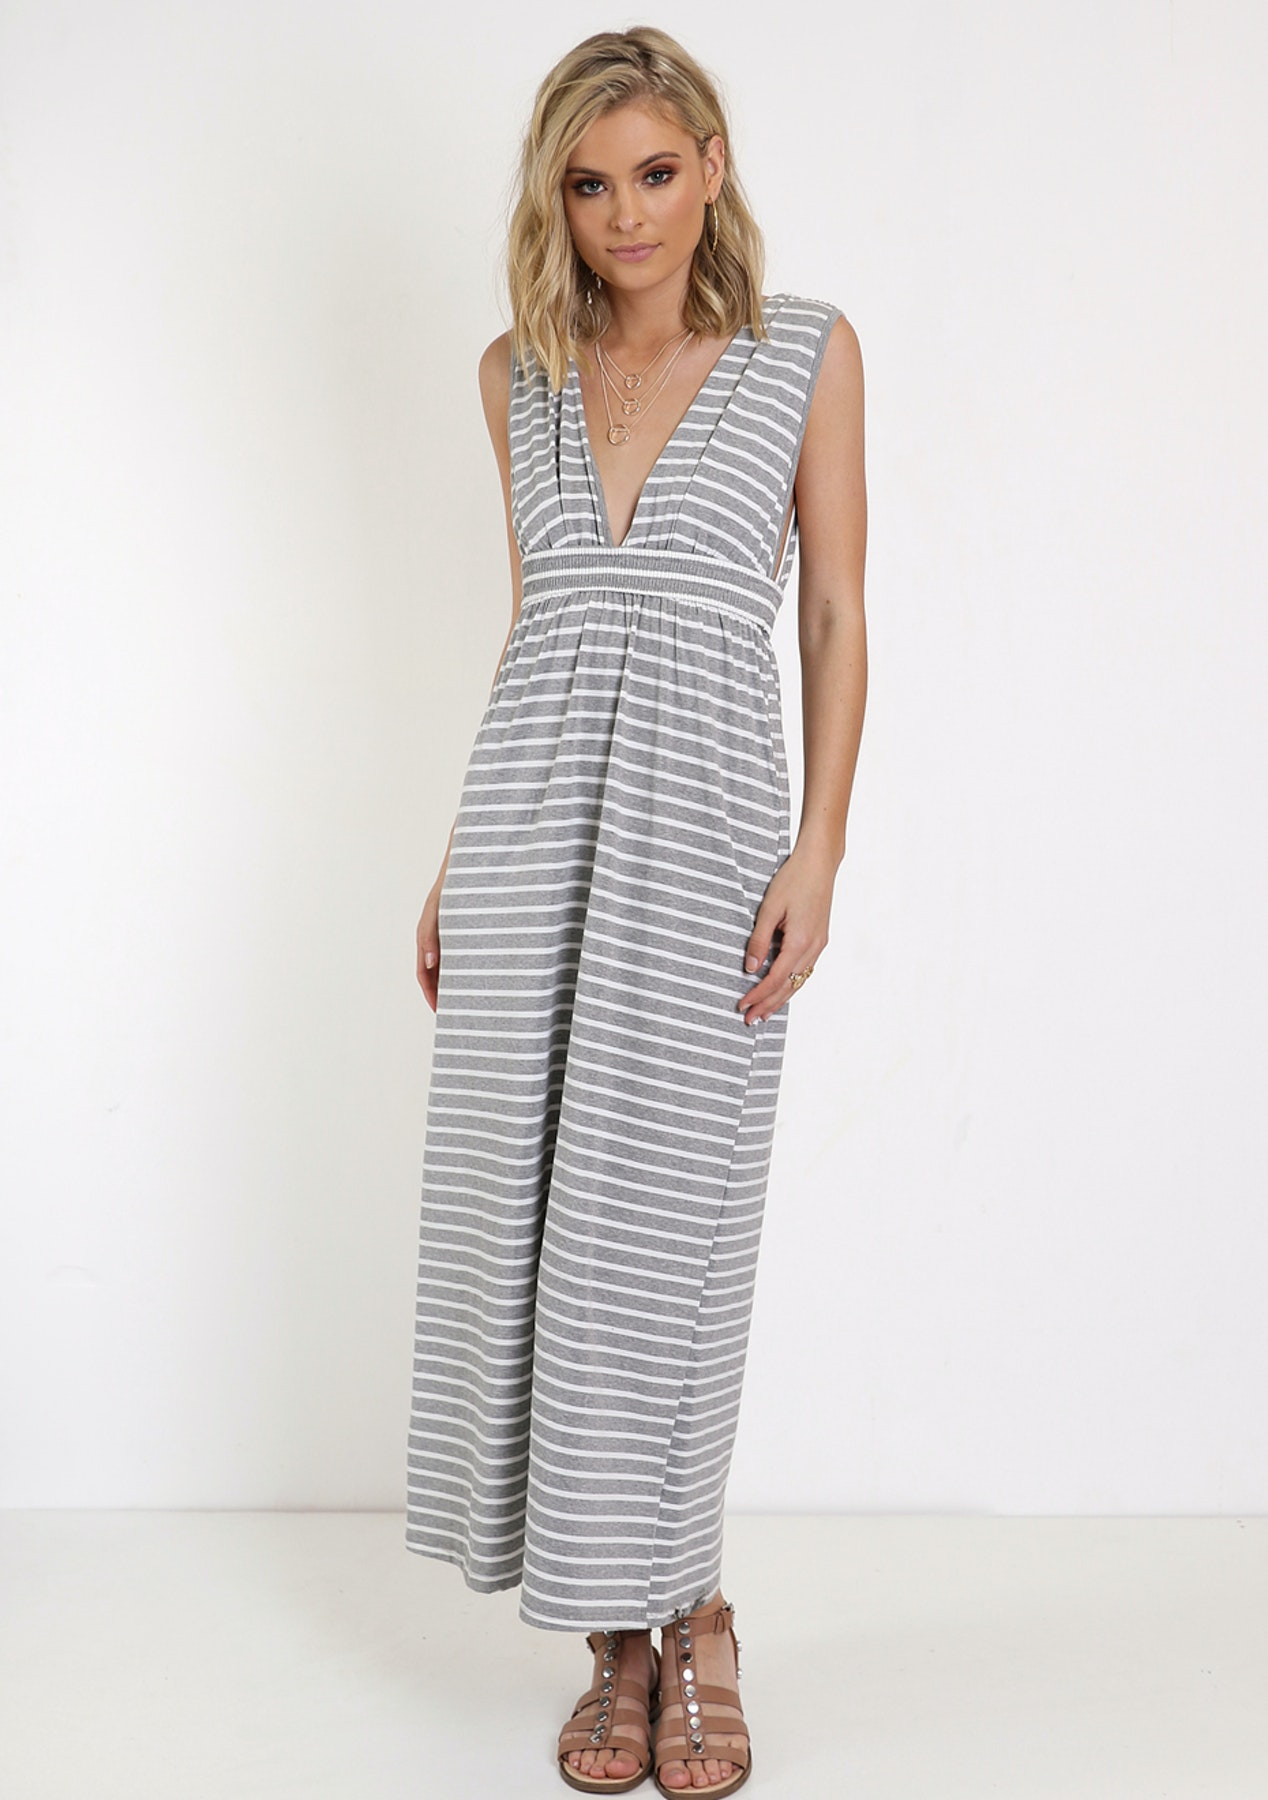 a71756b1e6c1c Madison - Limelight Maxi Dress - Grey